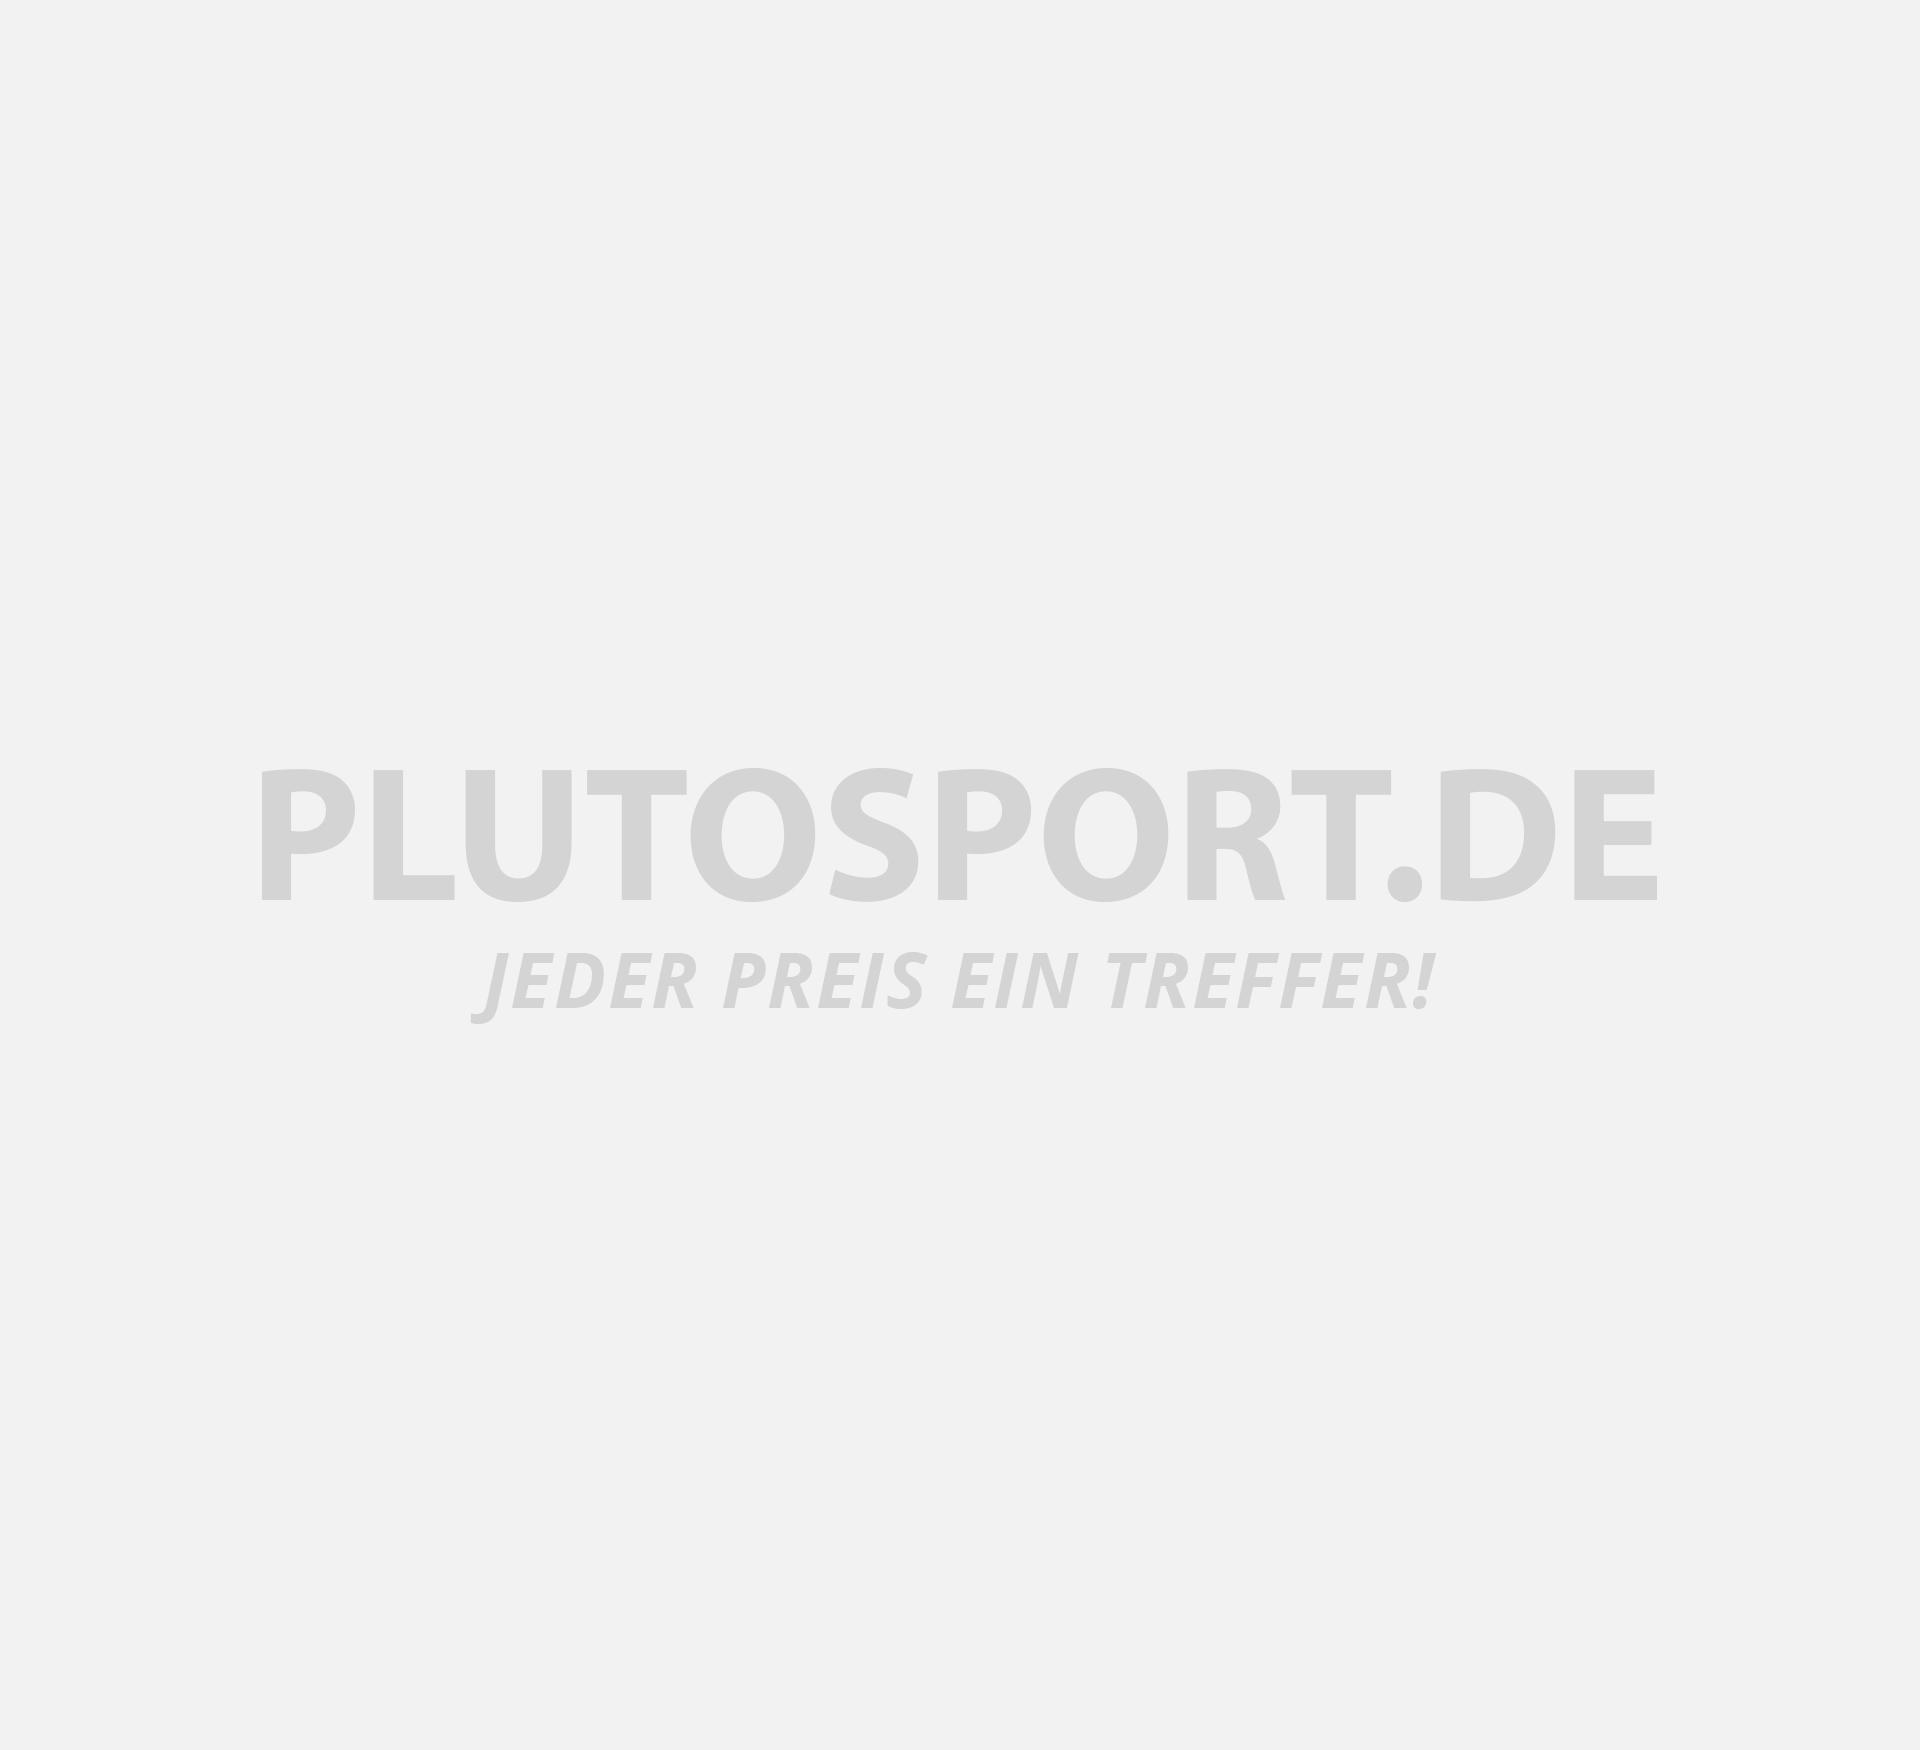 3a9b241461 Vans Ridge Skijacke Herren - Jacken - Kleidung - Wintersport ...